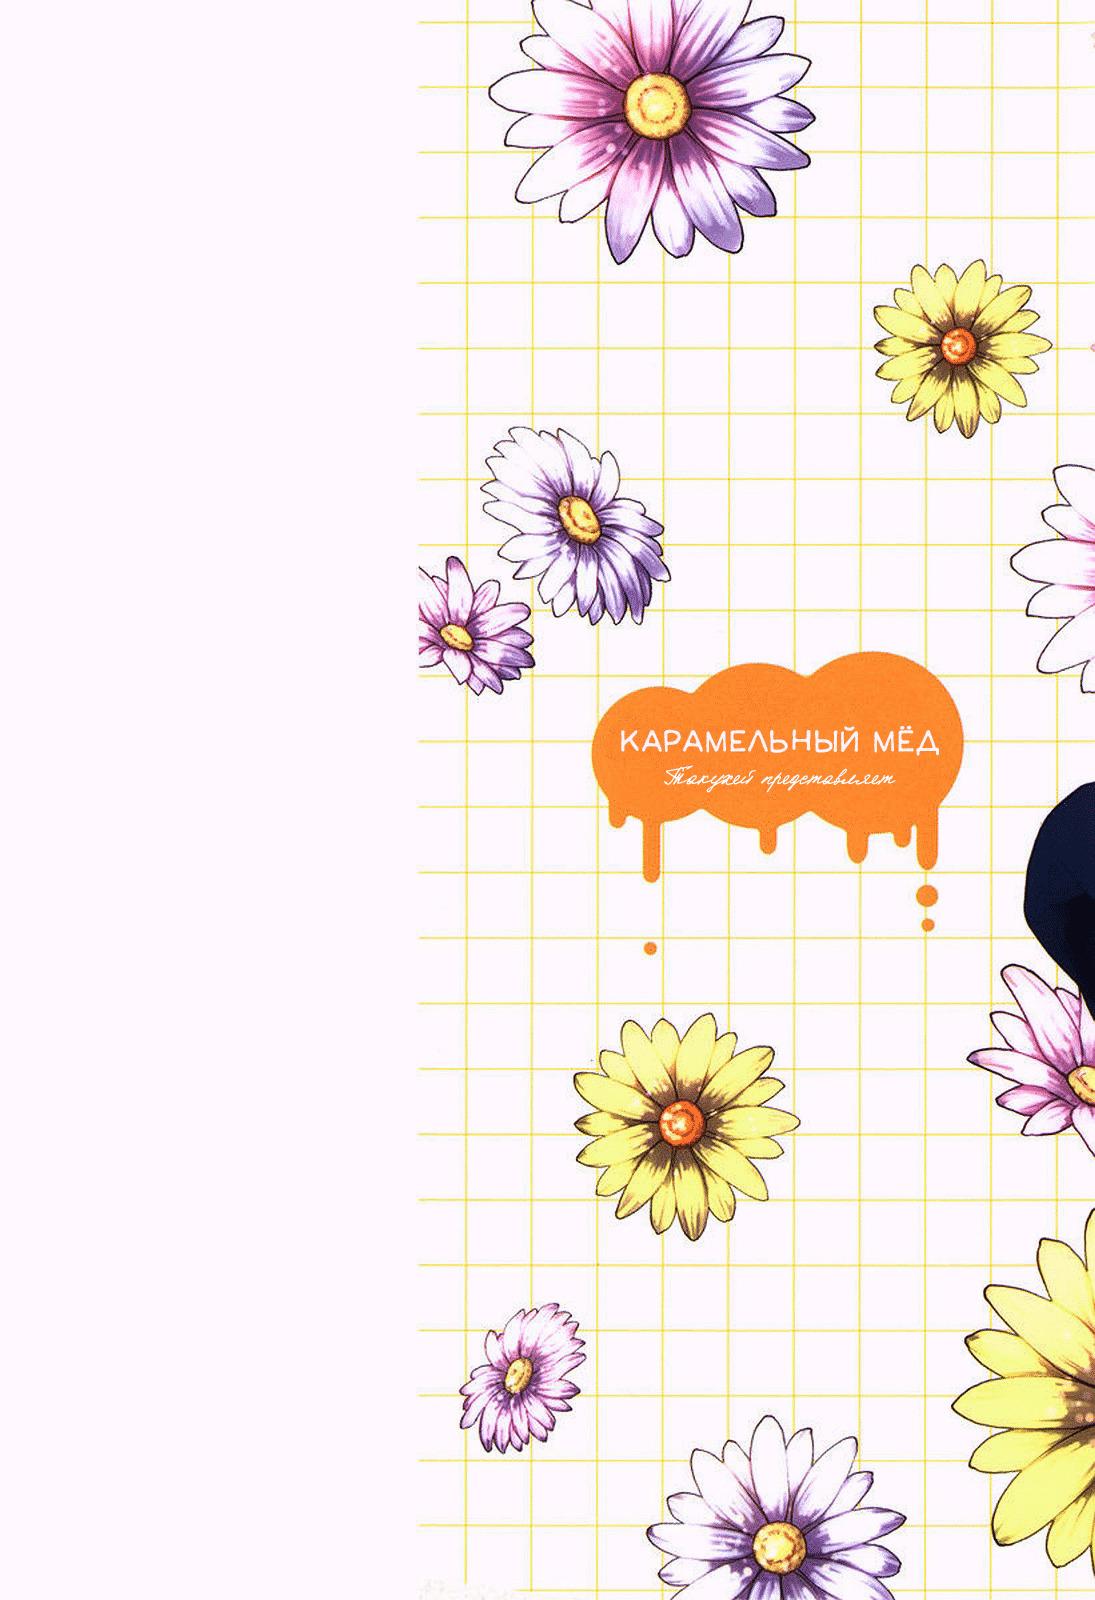 Манга Карамельный мёд / Caramel Honey - Глава 1 Страница 2